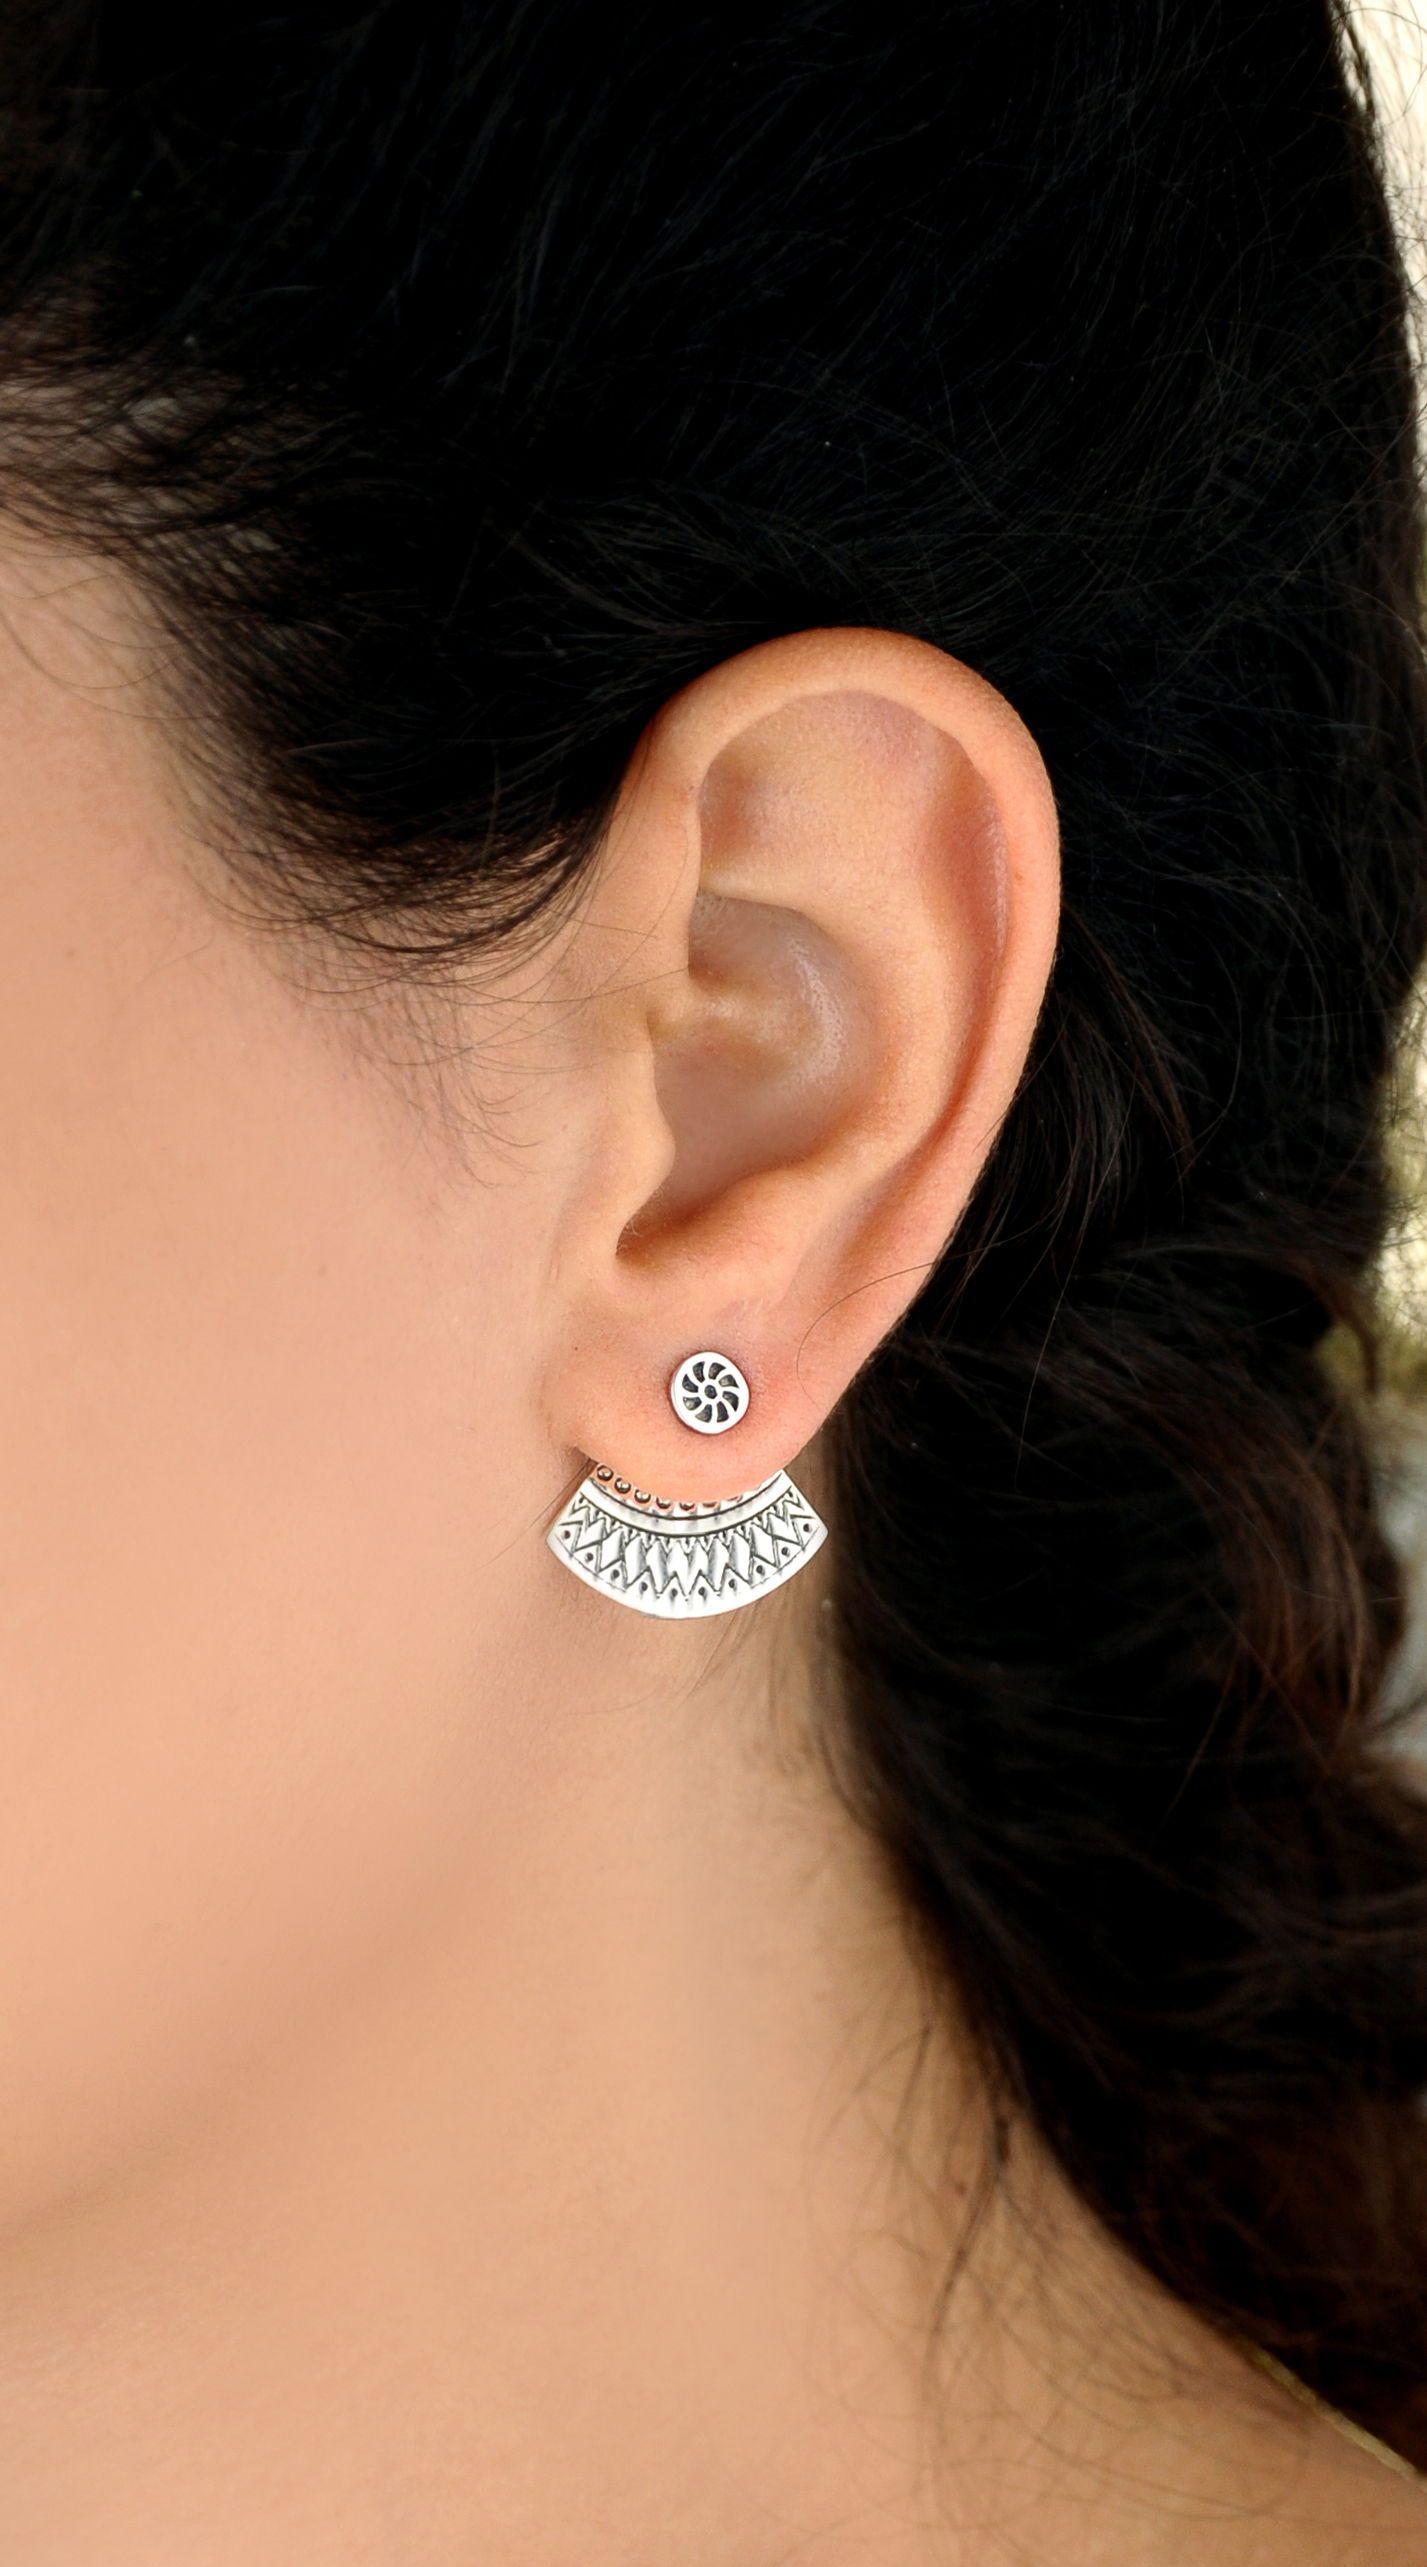 Fashion Boho Geometric Circle Dangle Drop Ear Stud Earrings Women Jewelry Gift